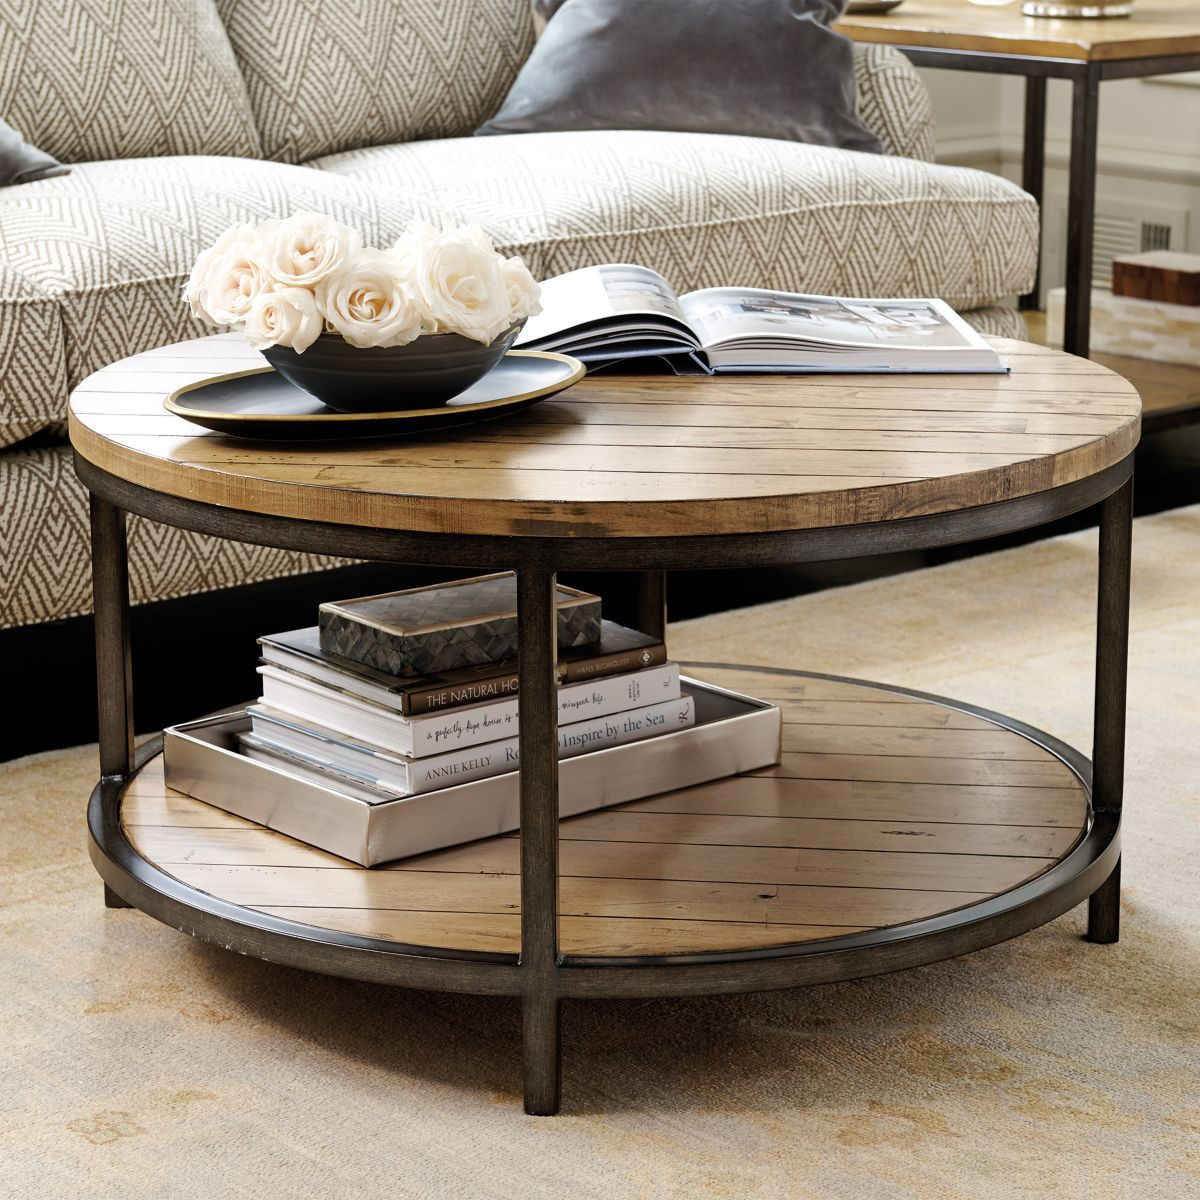 Durham Round Coffee Table Ballard Designs Salontafel Tafel Woonkamer Ronde Salontafel [ 1200 x 1200 Pixel ]